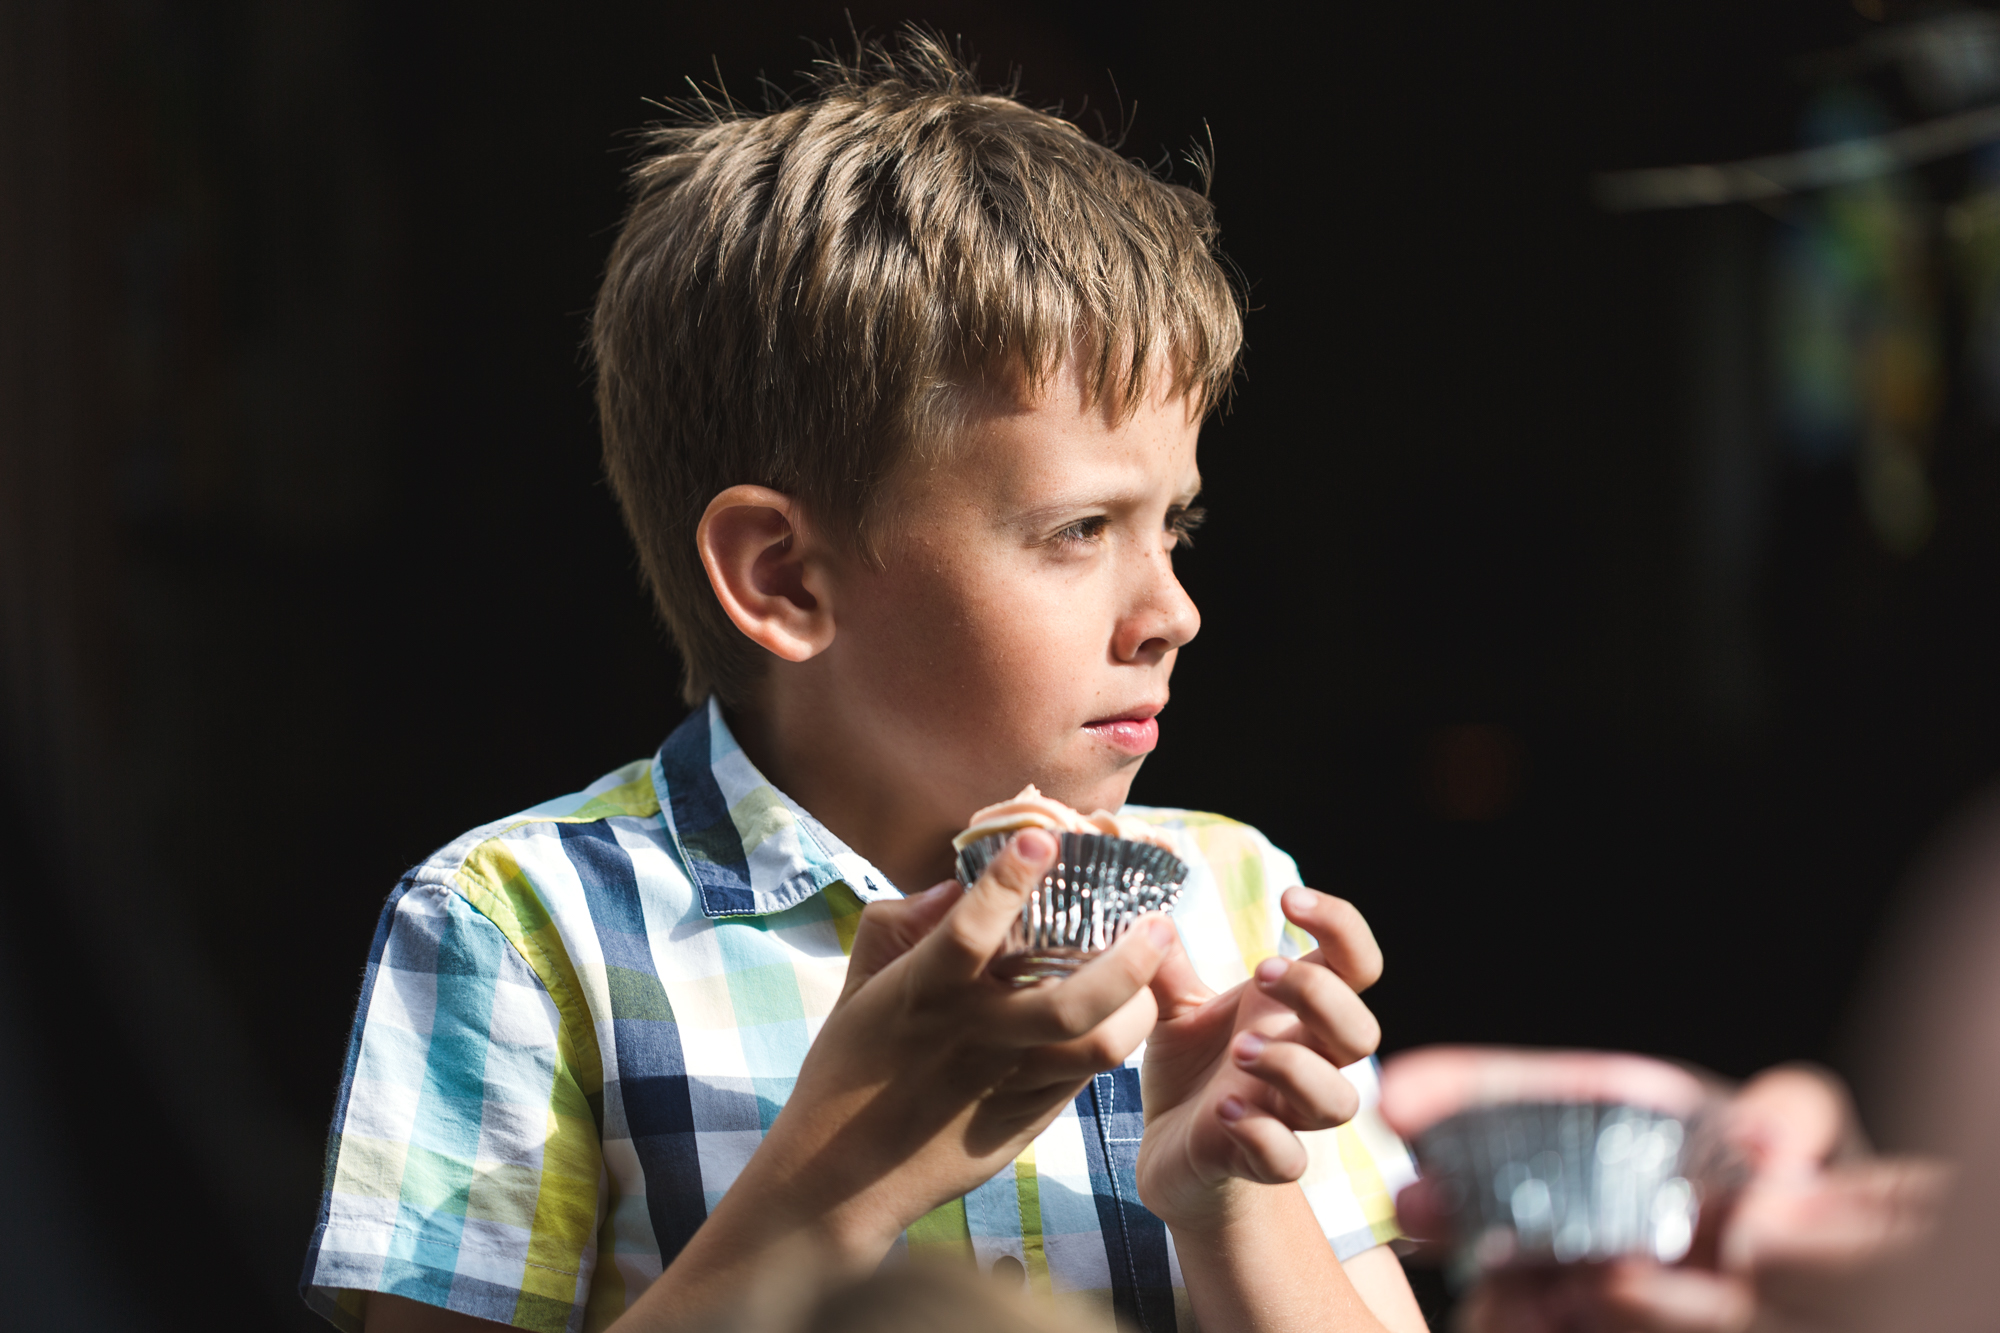 eating cake at a wedding at St Martins church Caerphilly